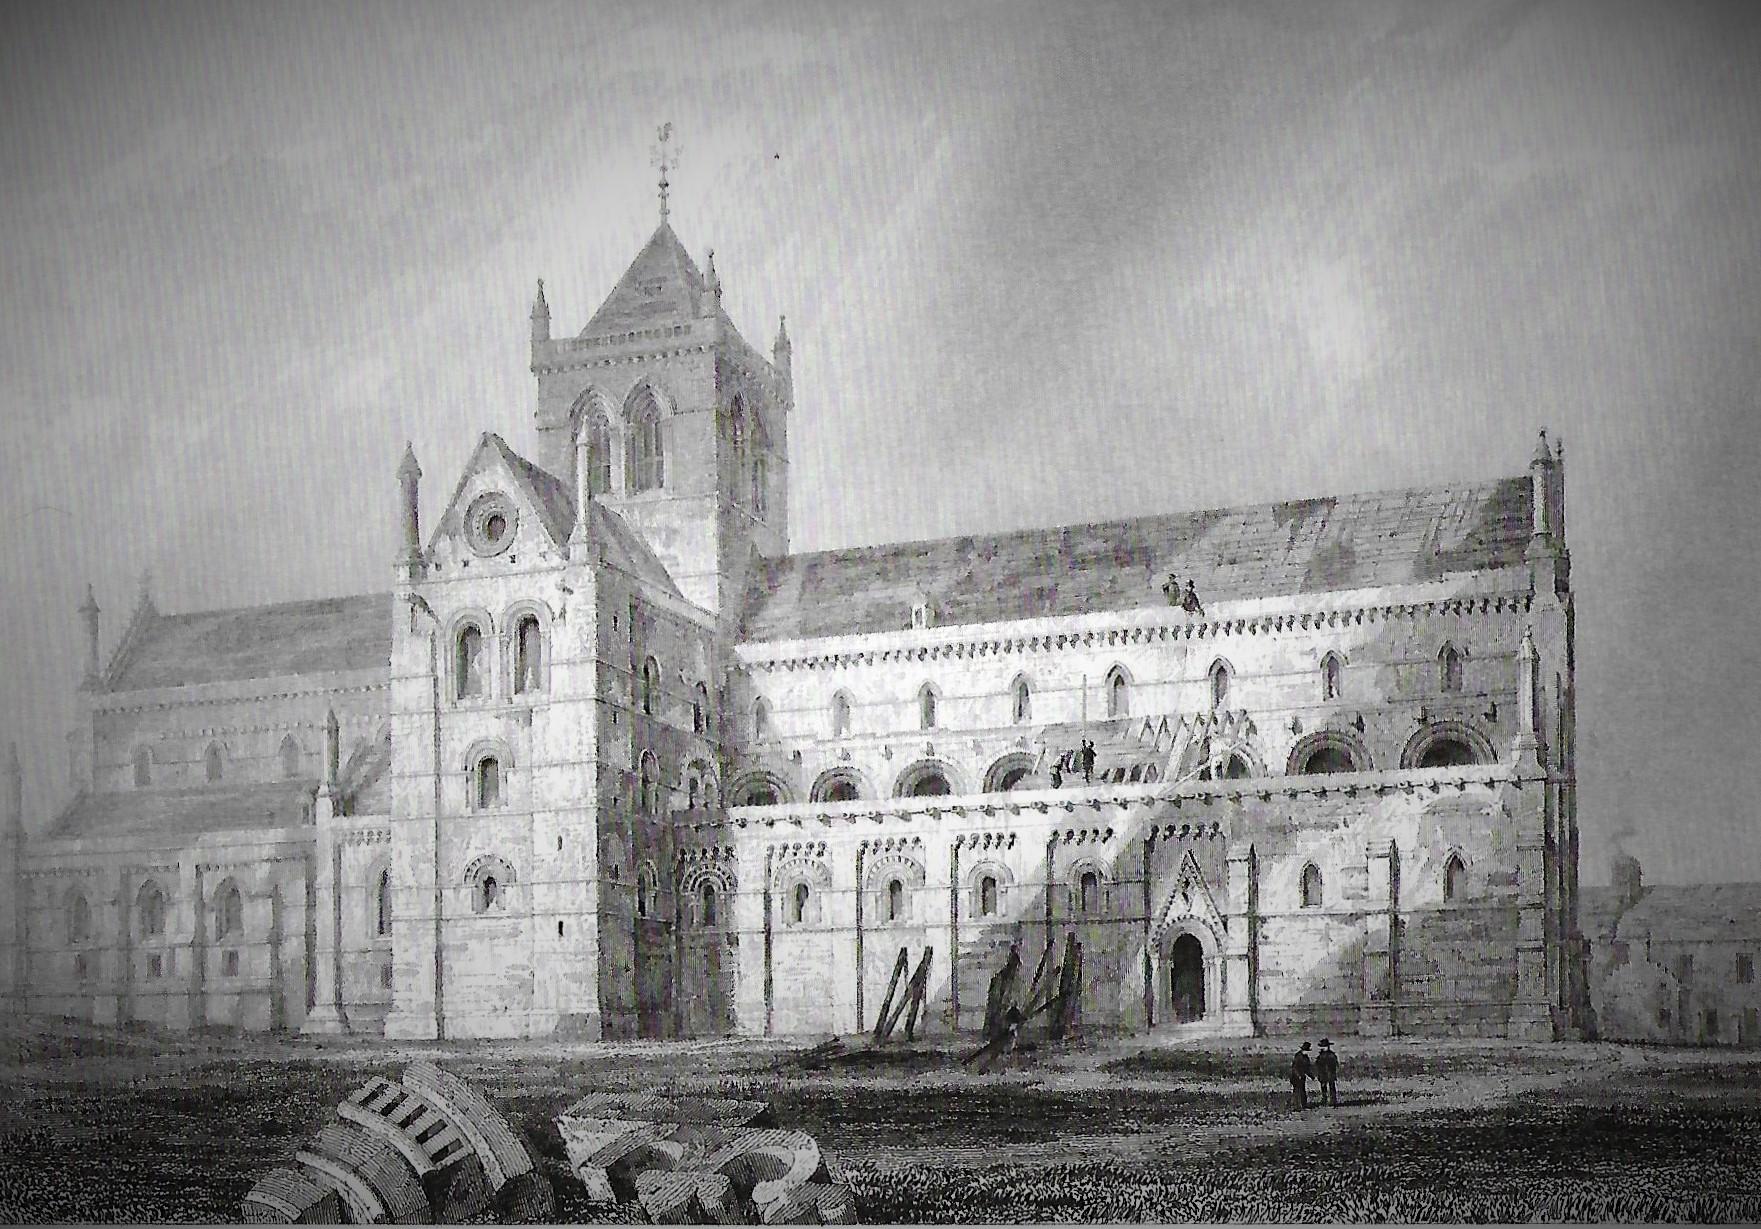 Old illustration of cathedral - Kirkwall, Orkney Islands, Orkney, Scotland, UK